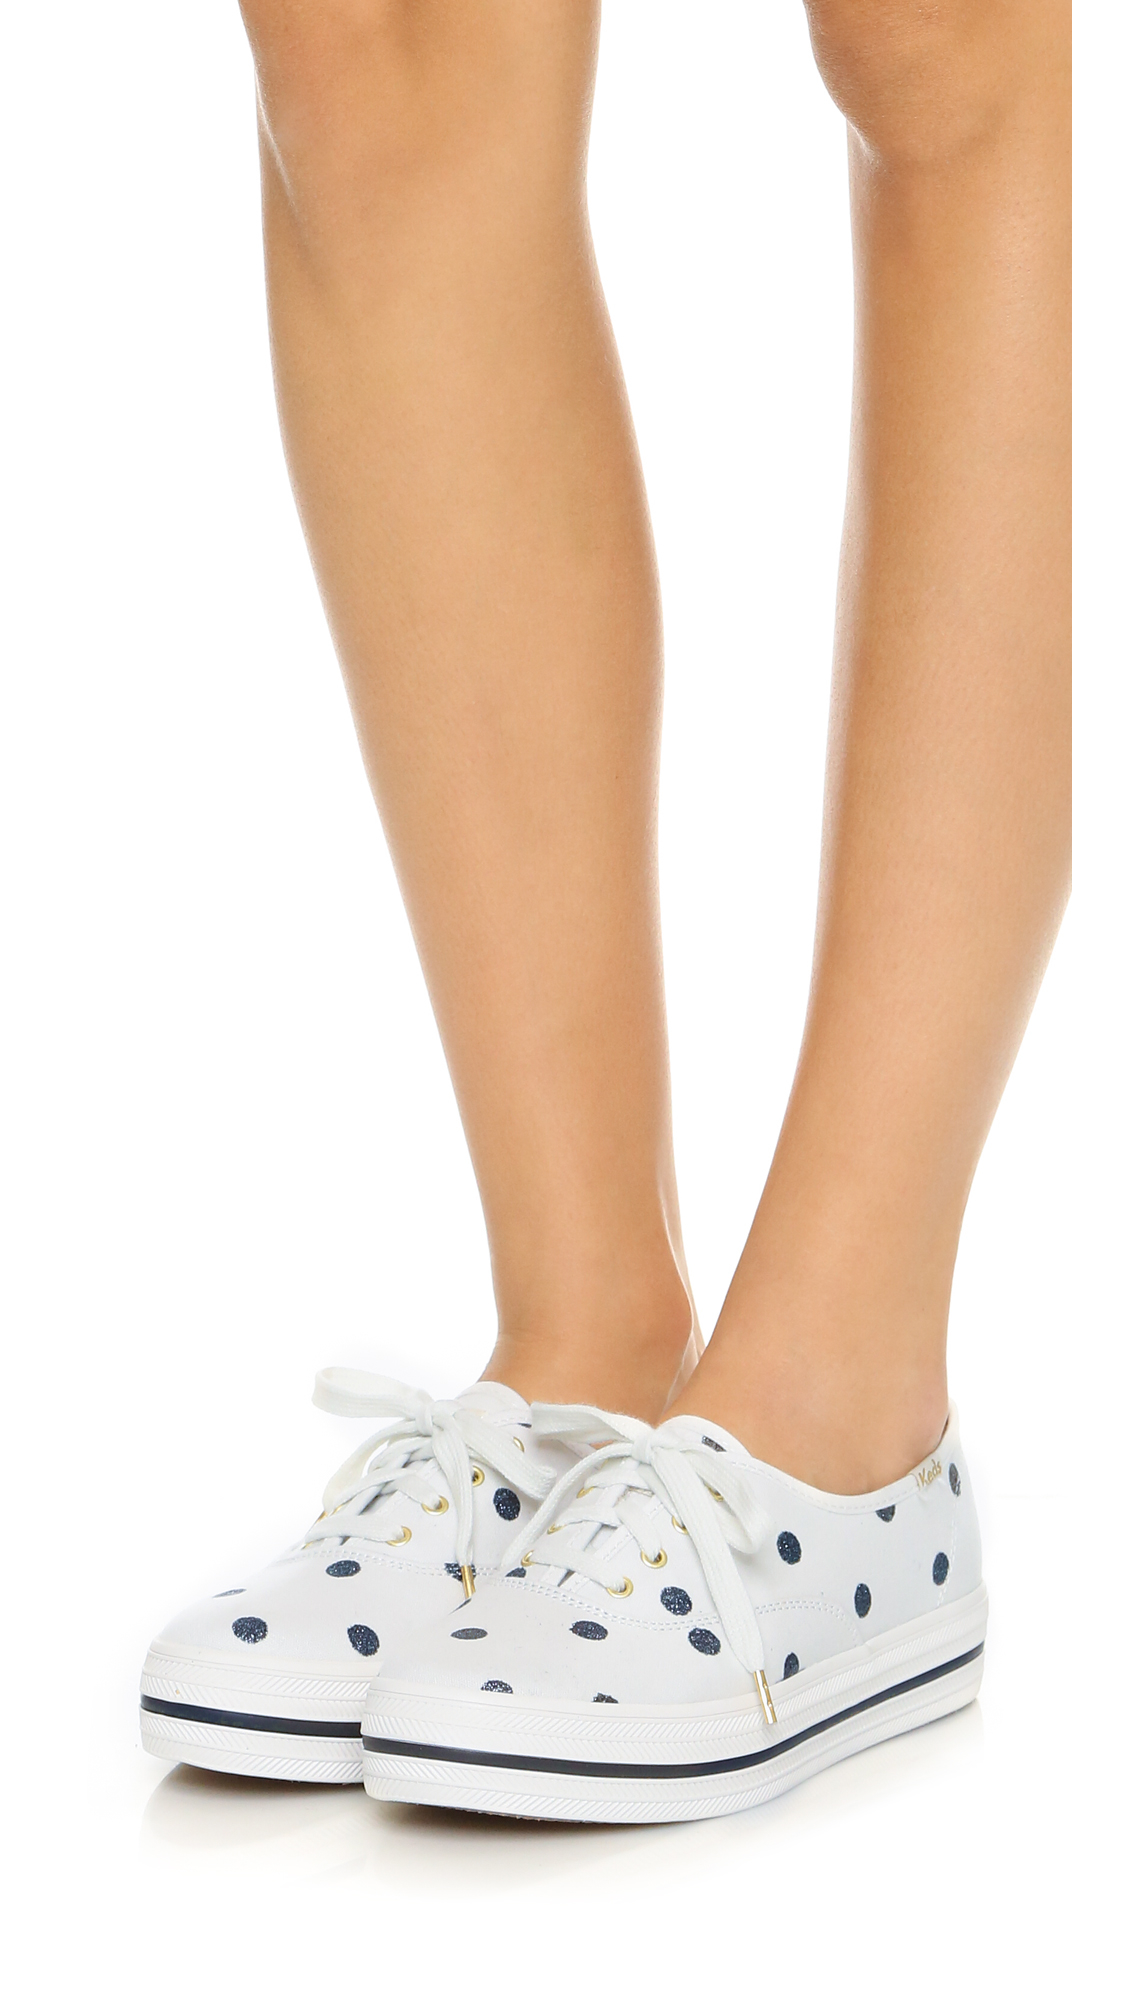 c800e7a1f3a9e0 Lyst - Kate Spade Keds For Kate Spade Triple Kick Dot Sneakers in Natural